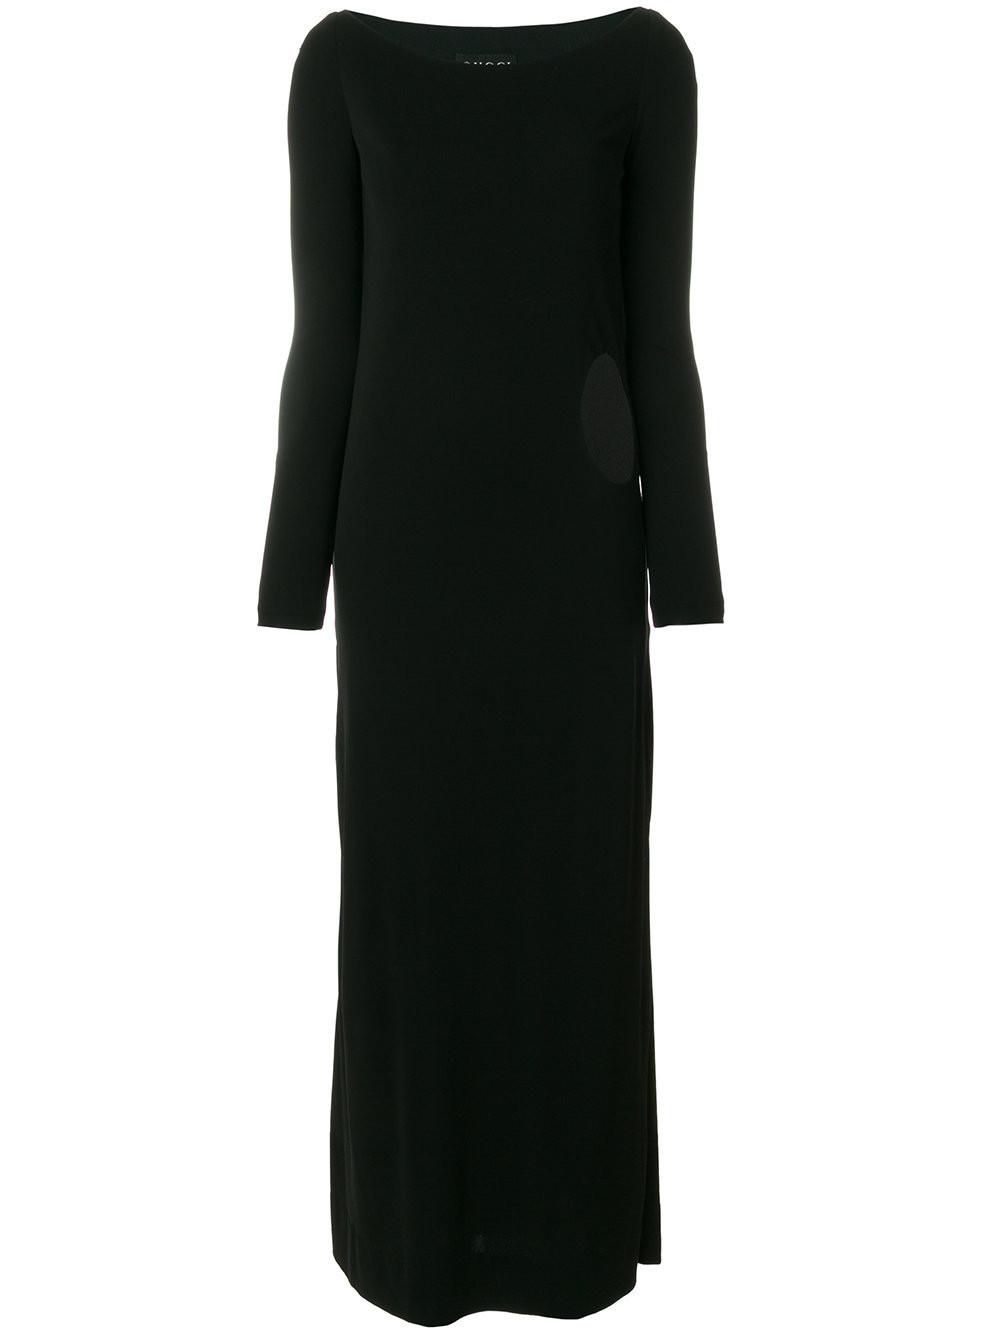 49812d8c6 Gucci Vintage Tom Ford for Gucci dress - Black